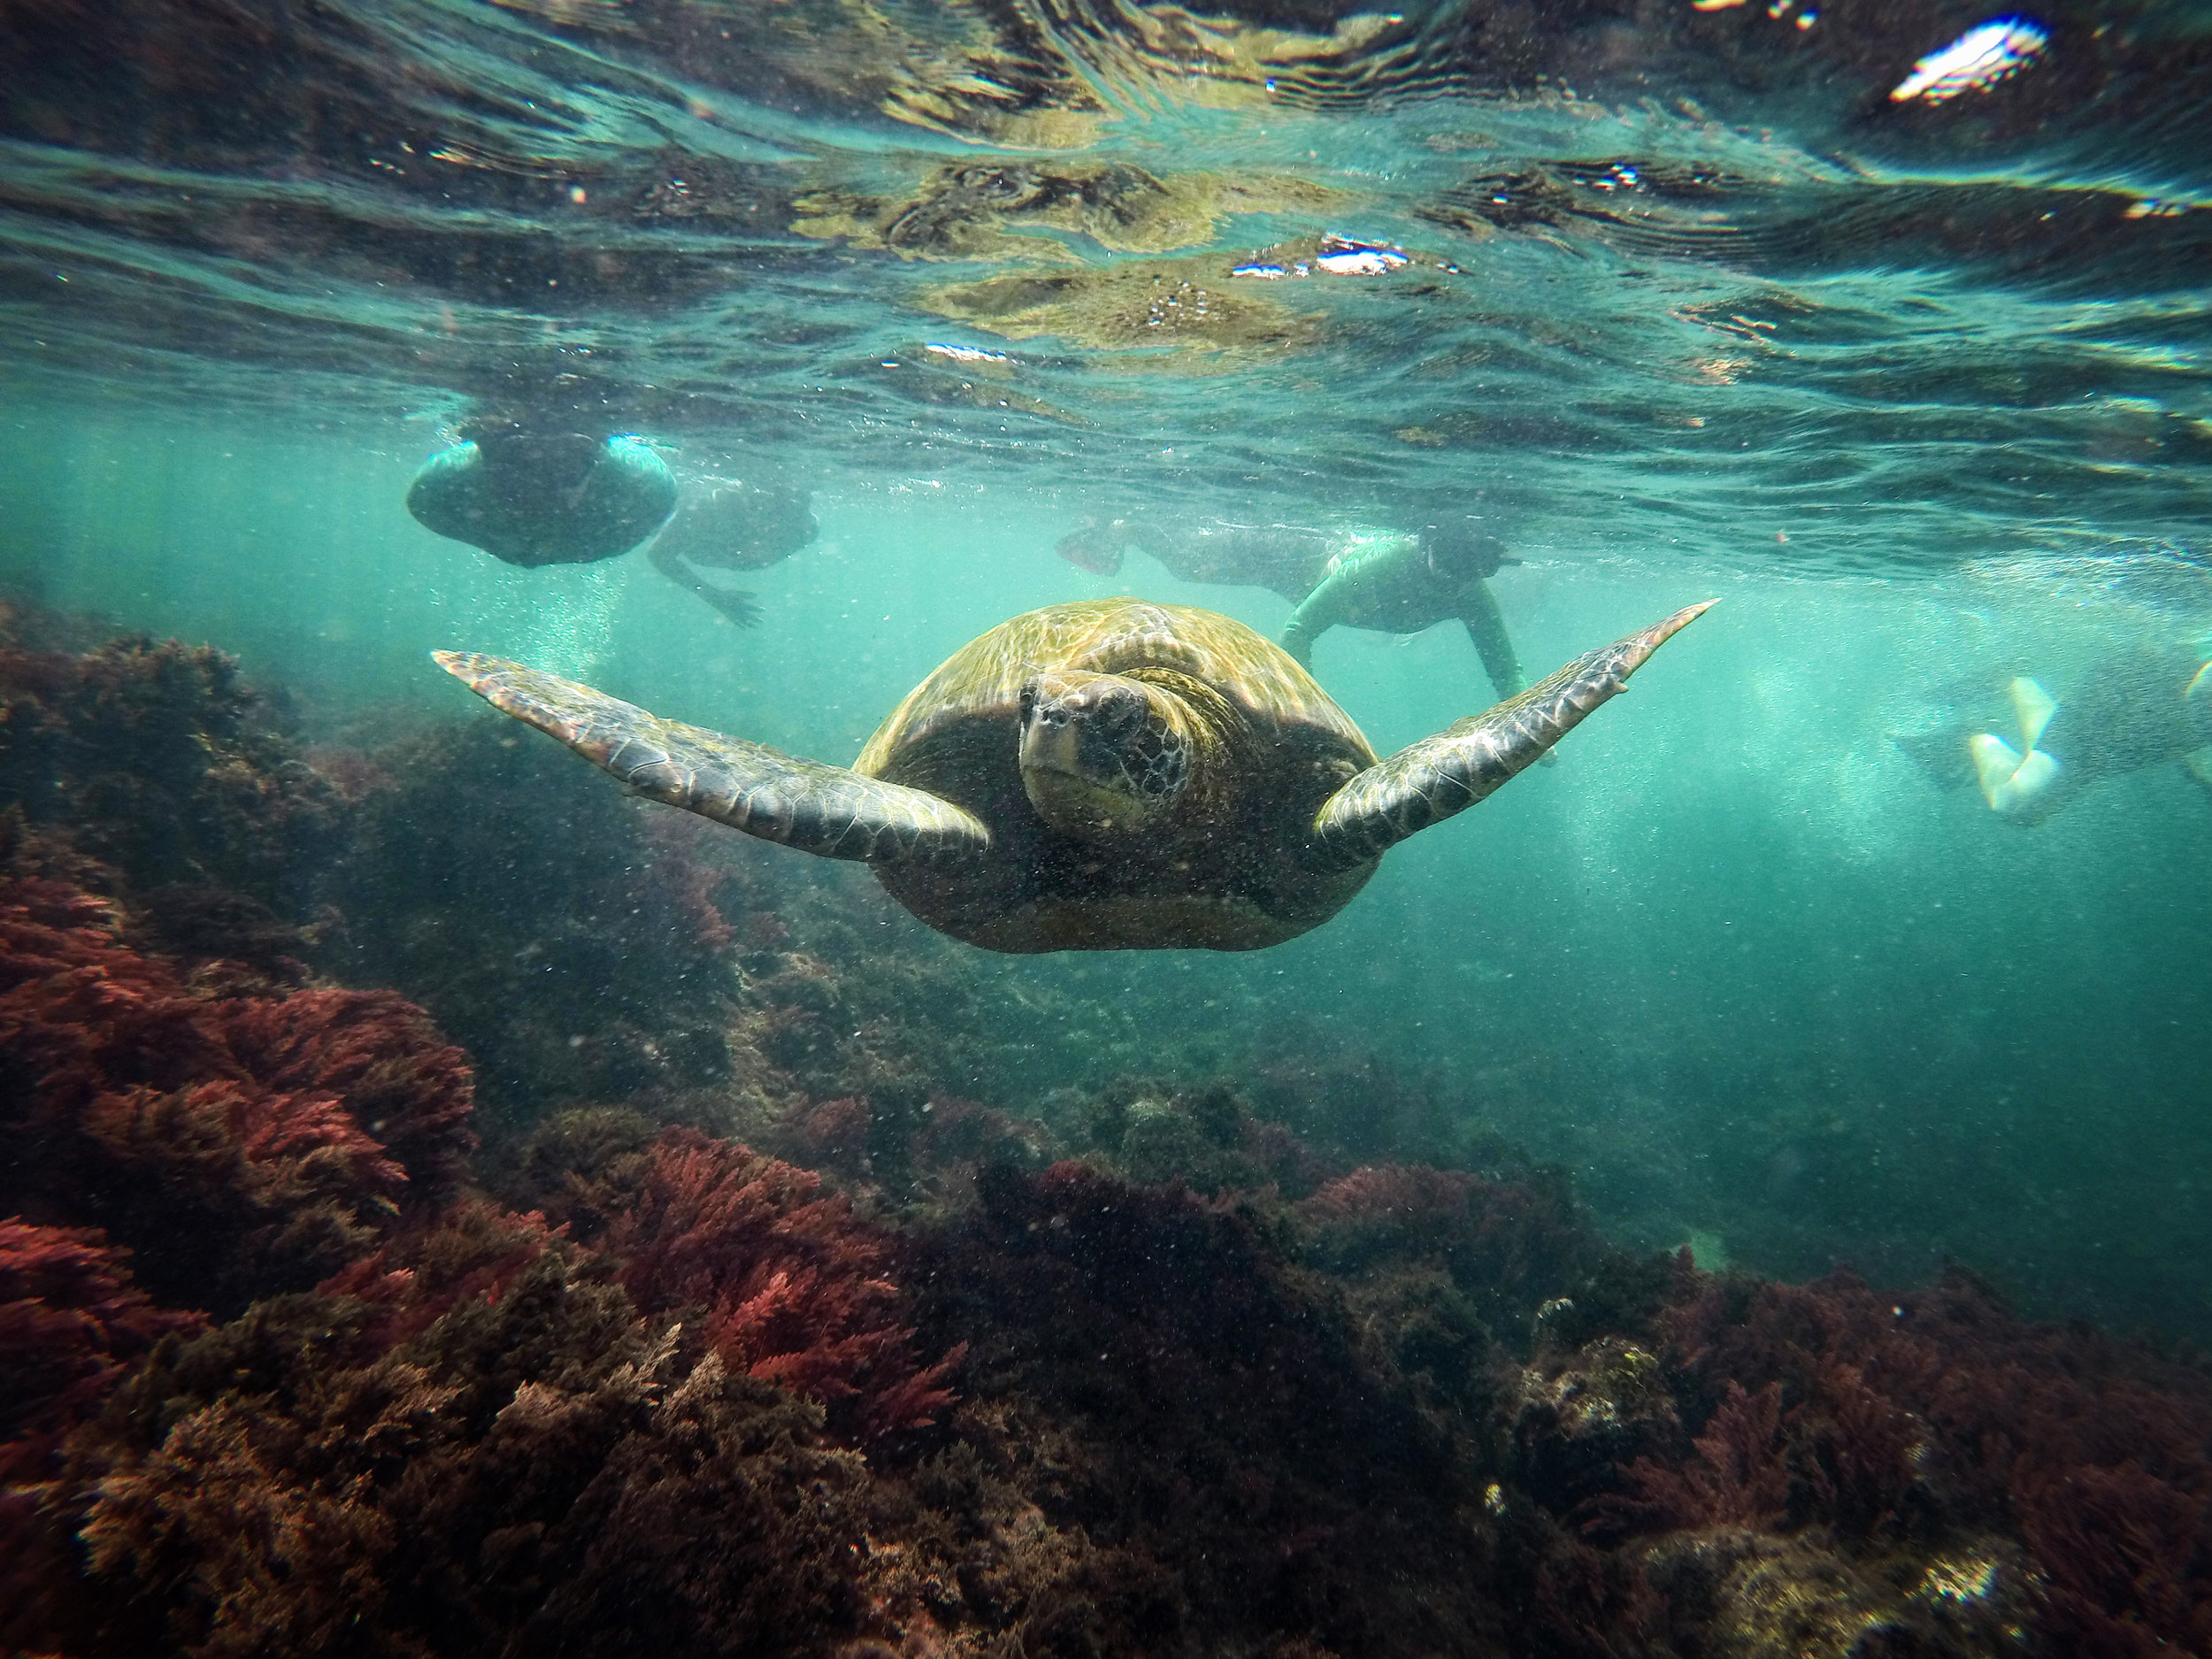 A green sea turtle leads the way through Los Túneles off Isabela Island